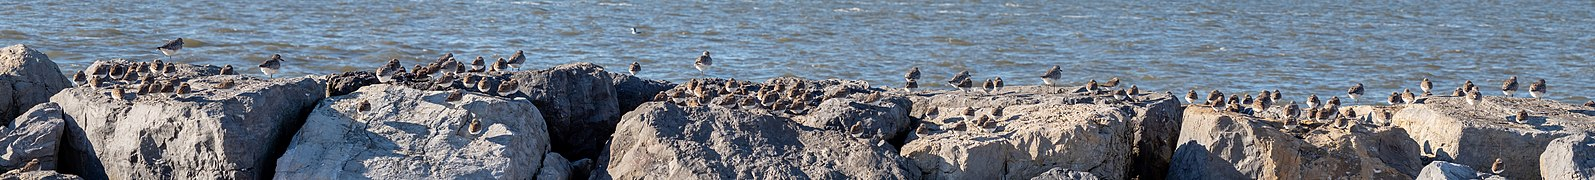 Shorebirds at Jones Beach (04113p).jpg